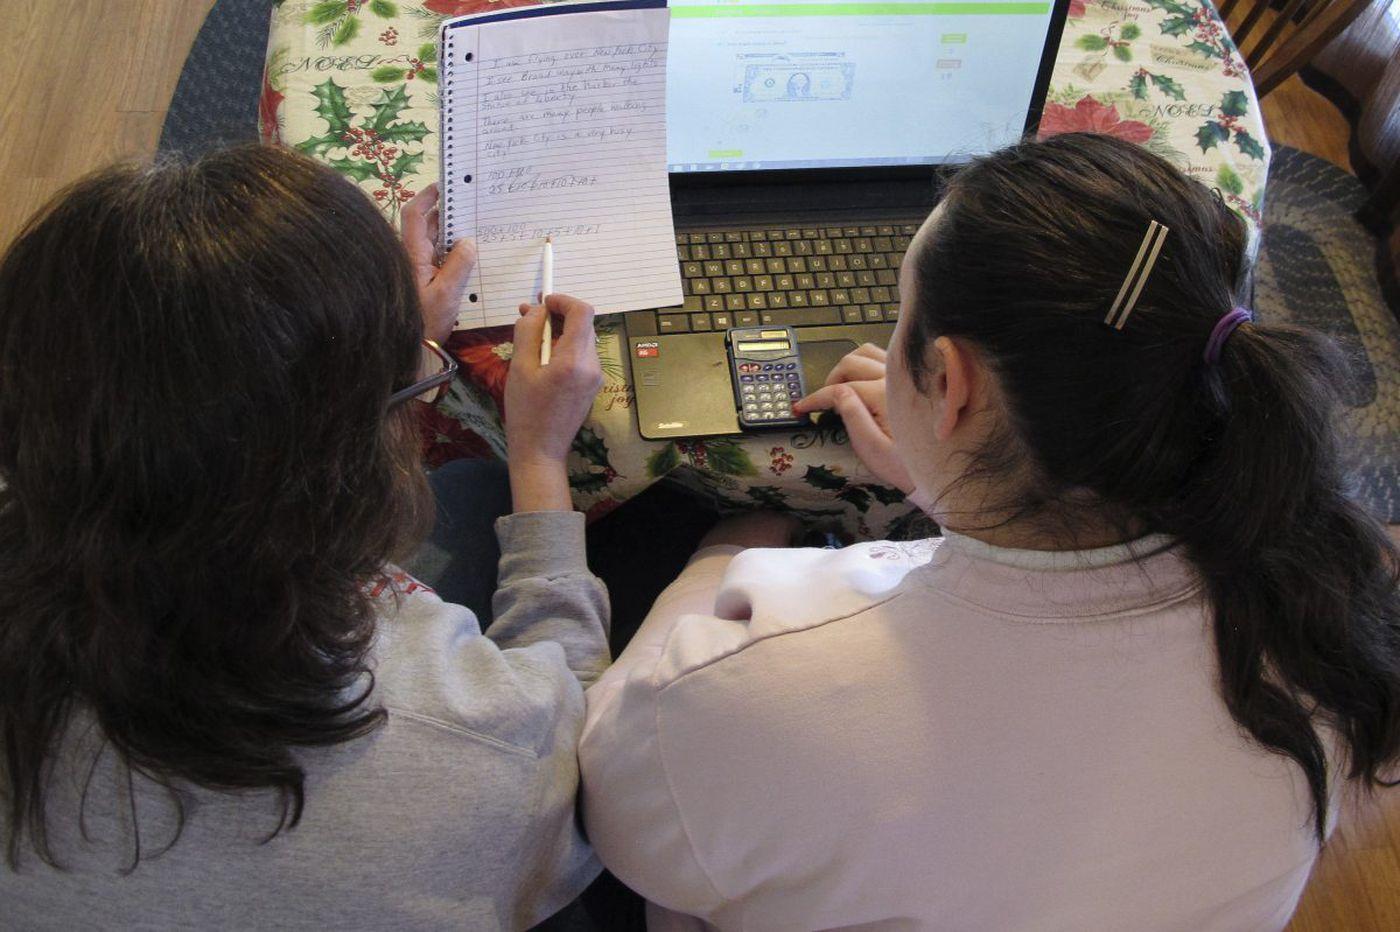 Pennsylvania slow to reform charter-school laws | Editorial